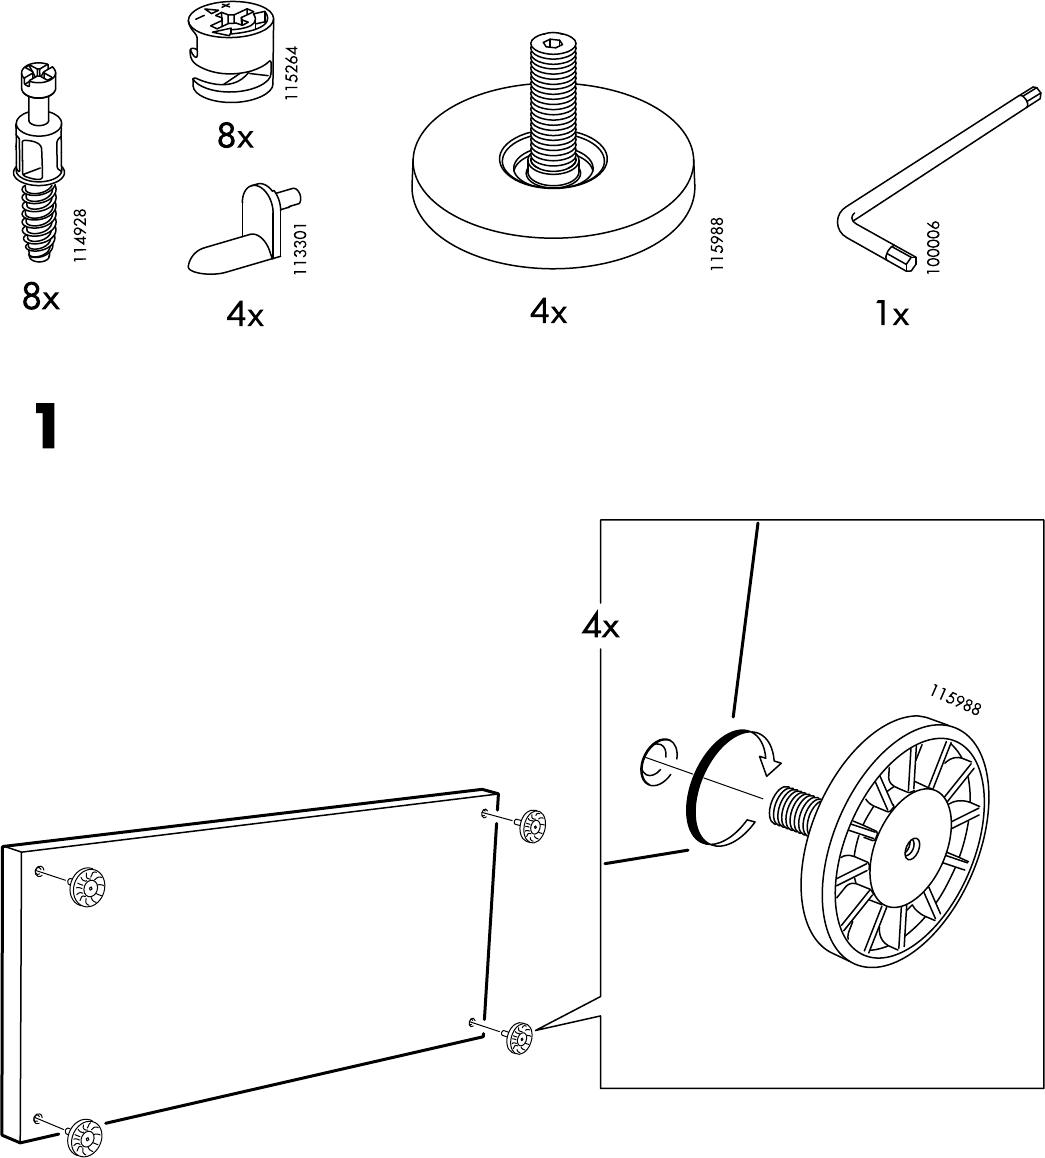 Ikea Mosjo Tv Meubel.Handleiding Ikea Mosjo Tv Meubel Pagina 3 Van 8 Alle Talen